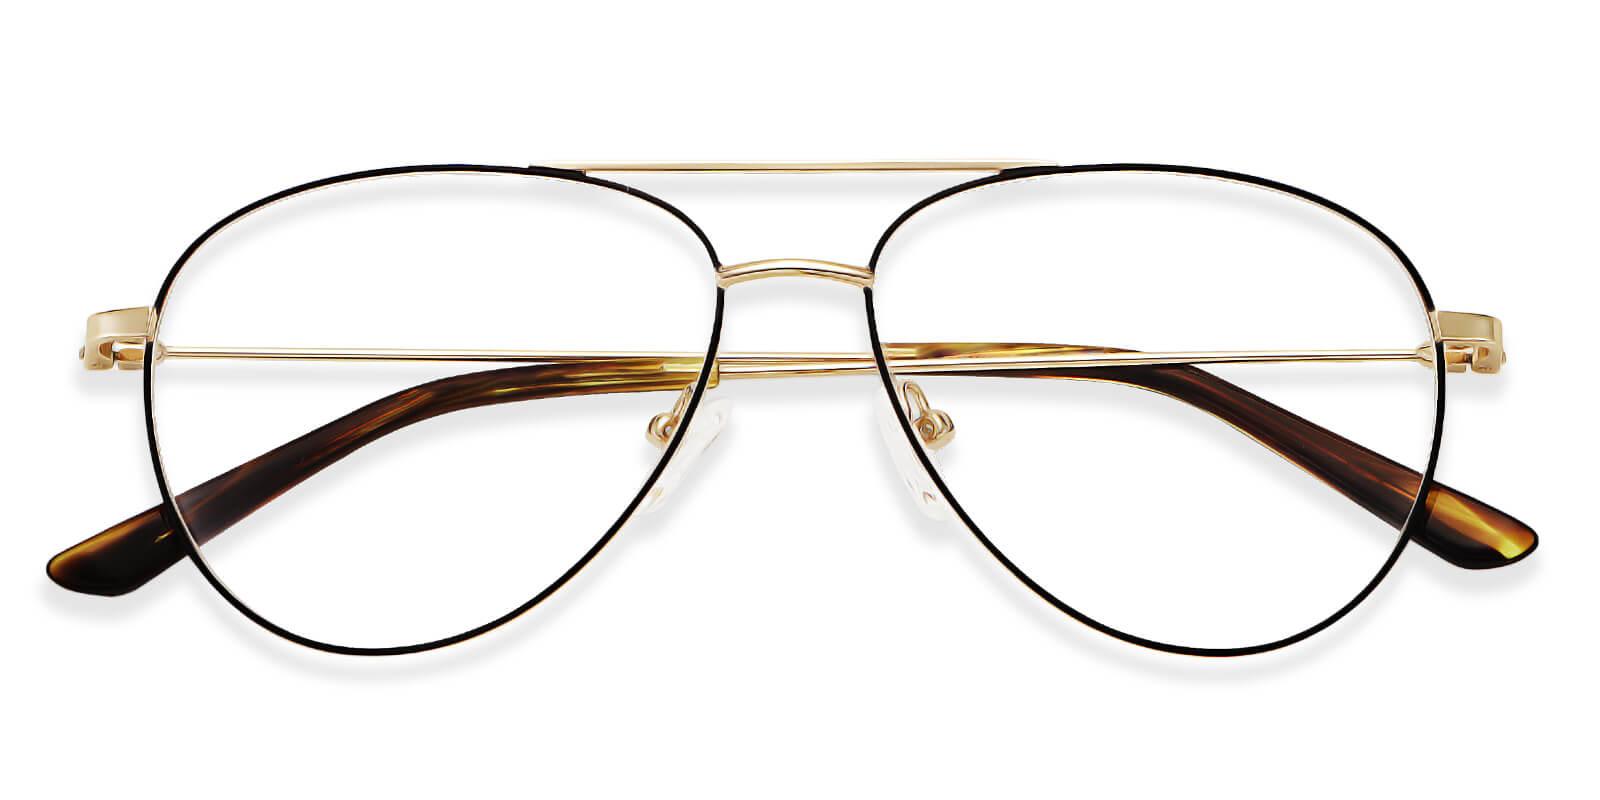 Palm-Aviator metal frame glasses for women and men